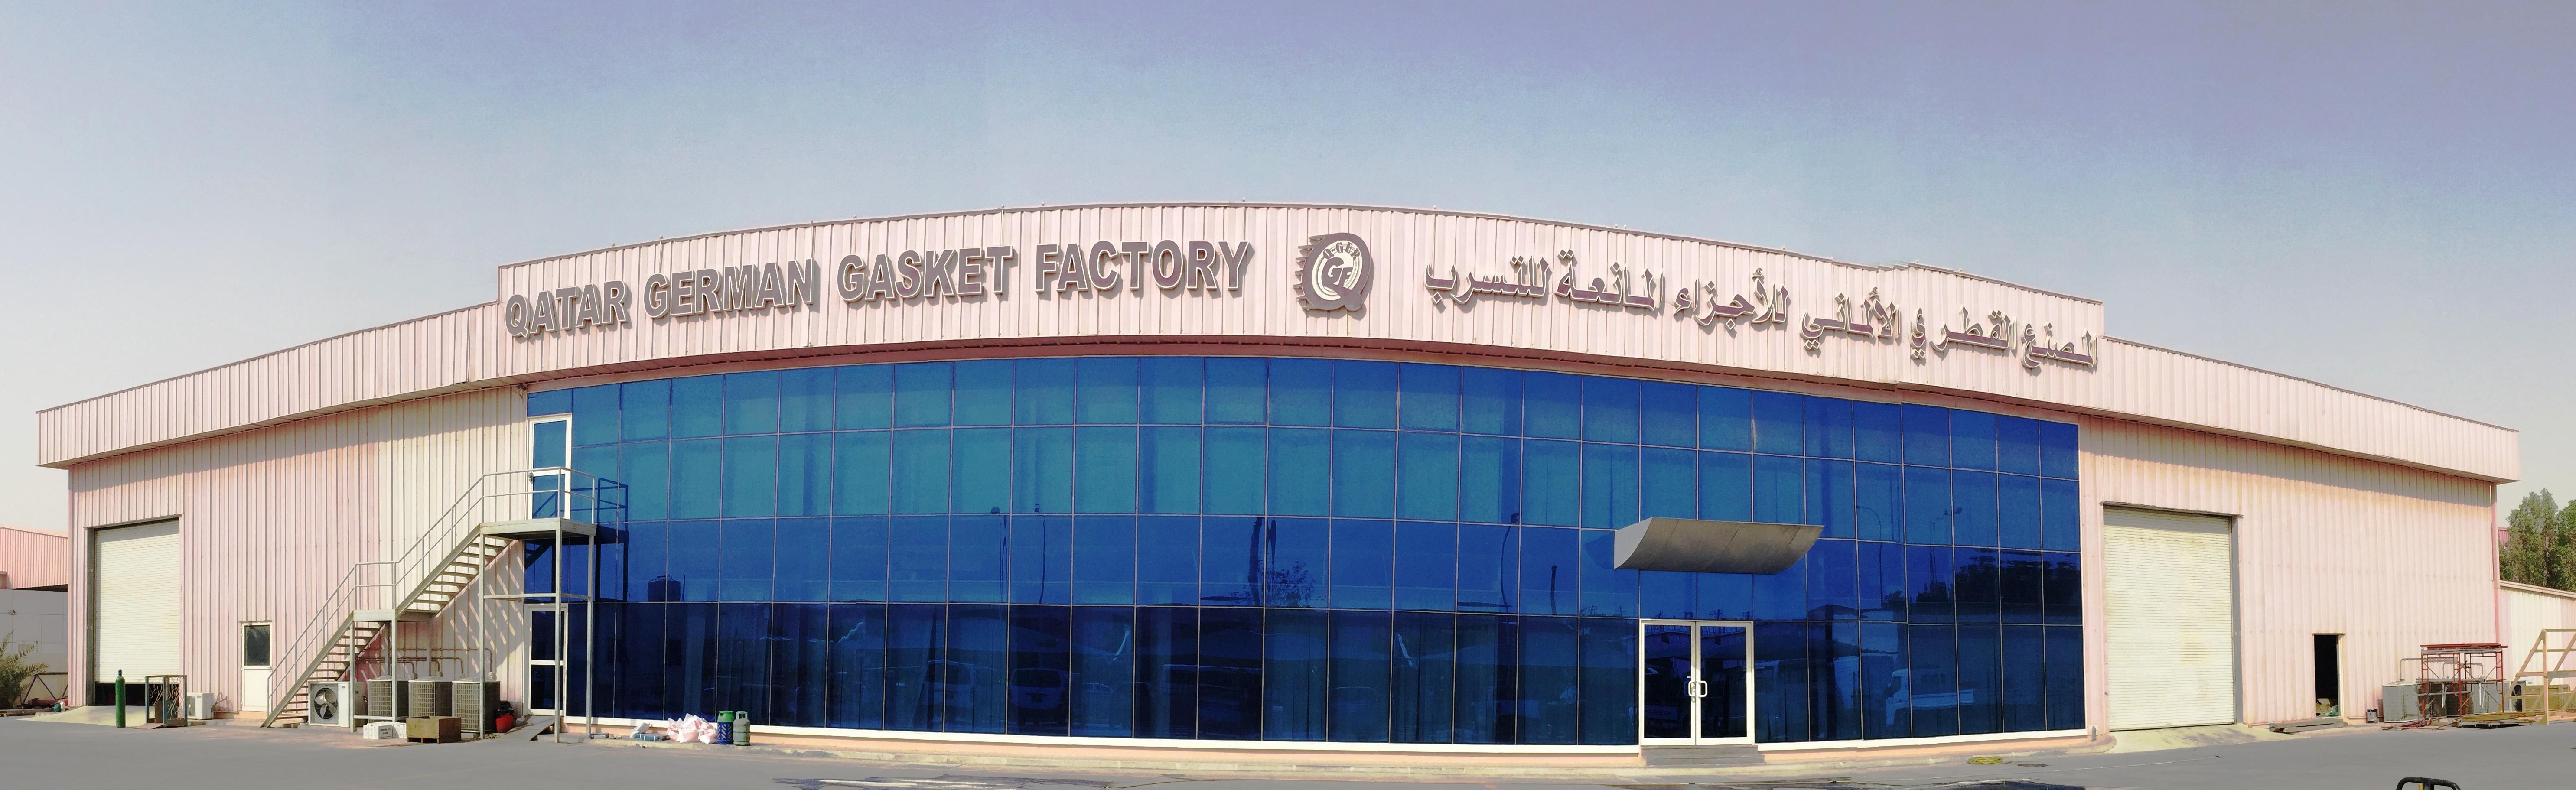 Qatar German Gasket Factory | LinkedIn